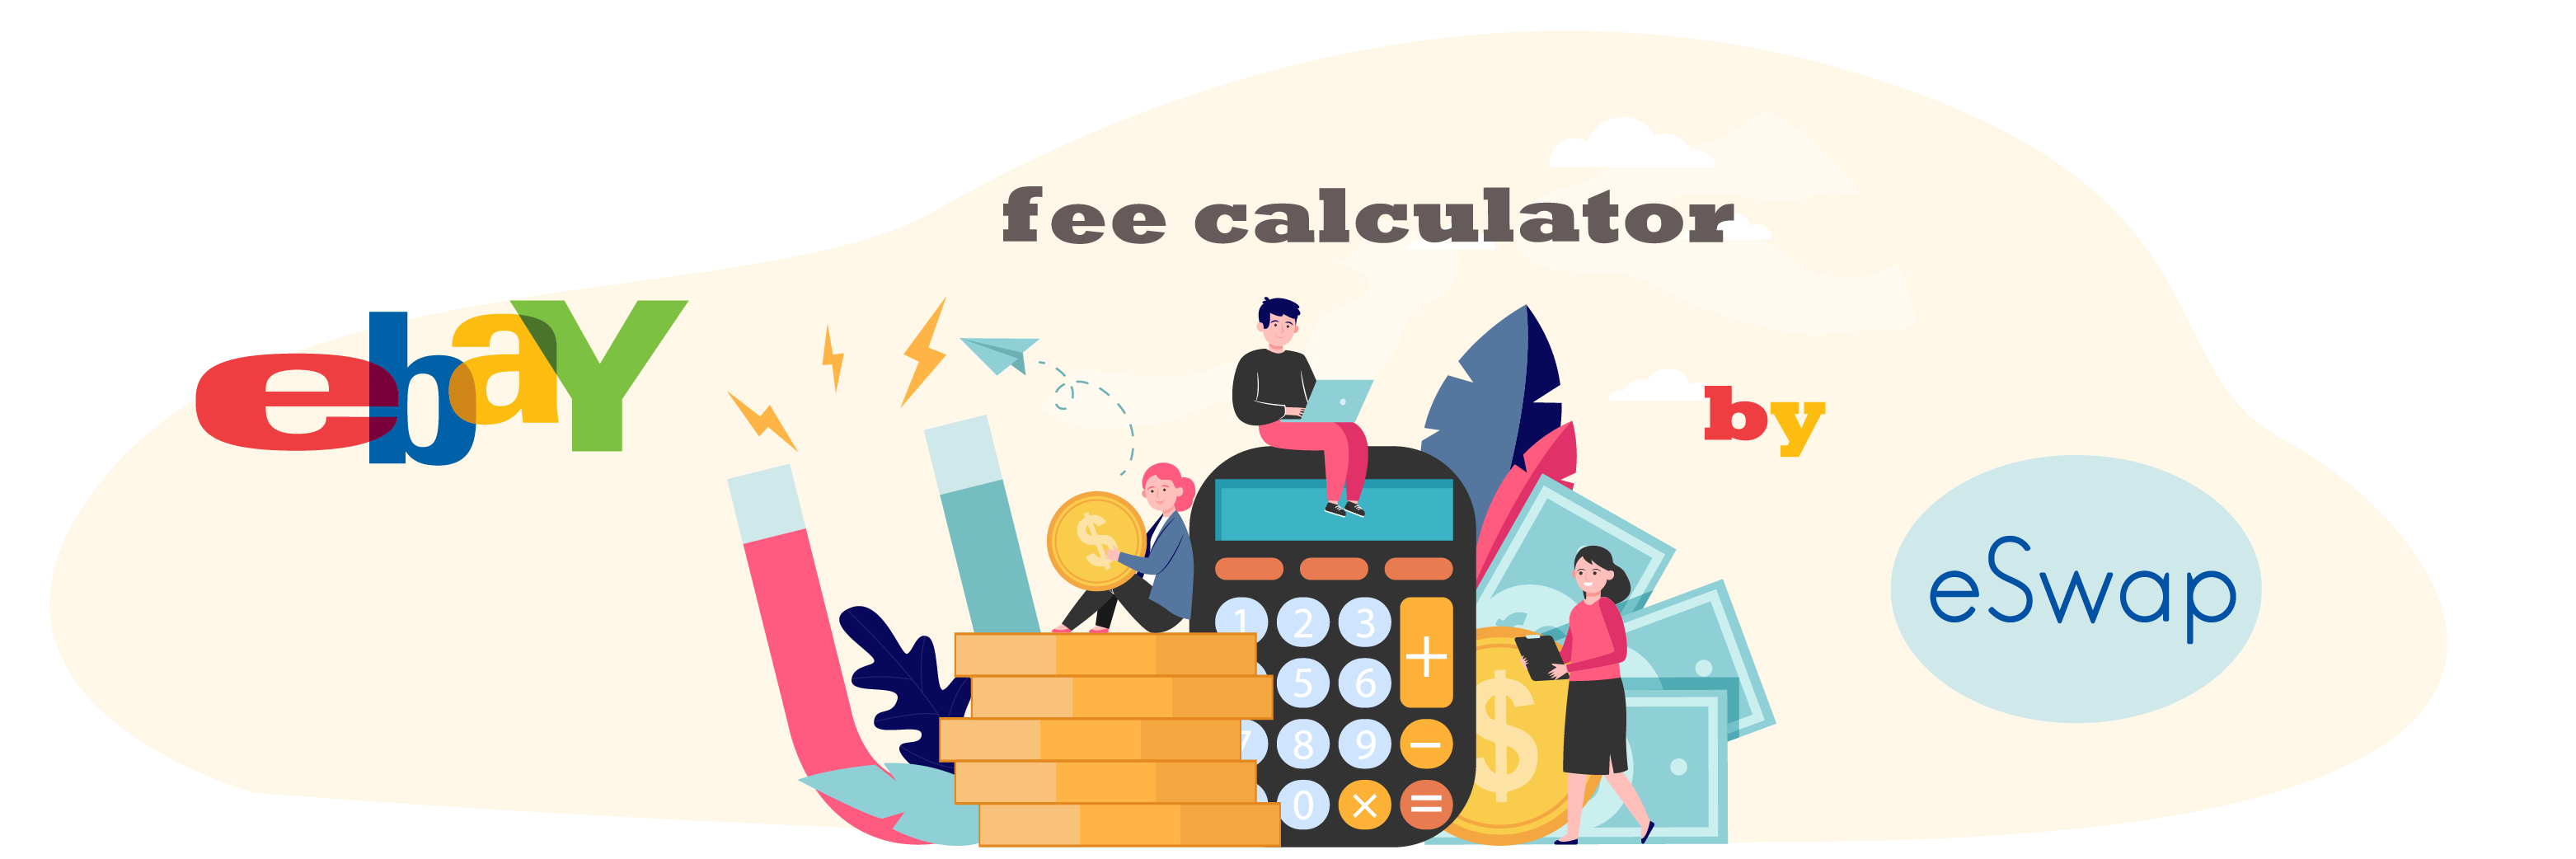 ebay fee calculator